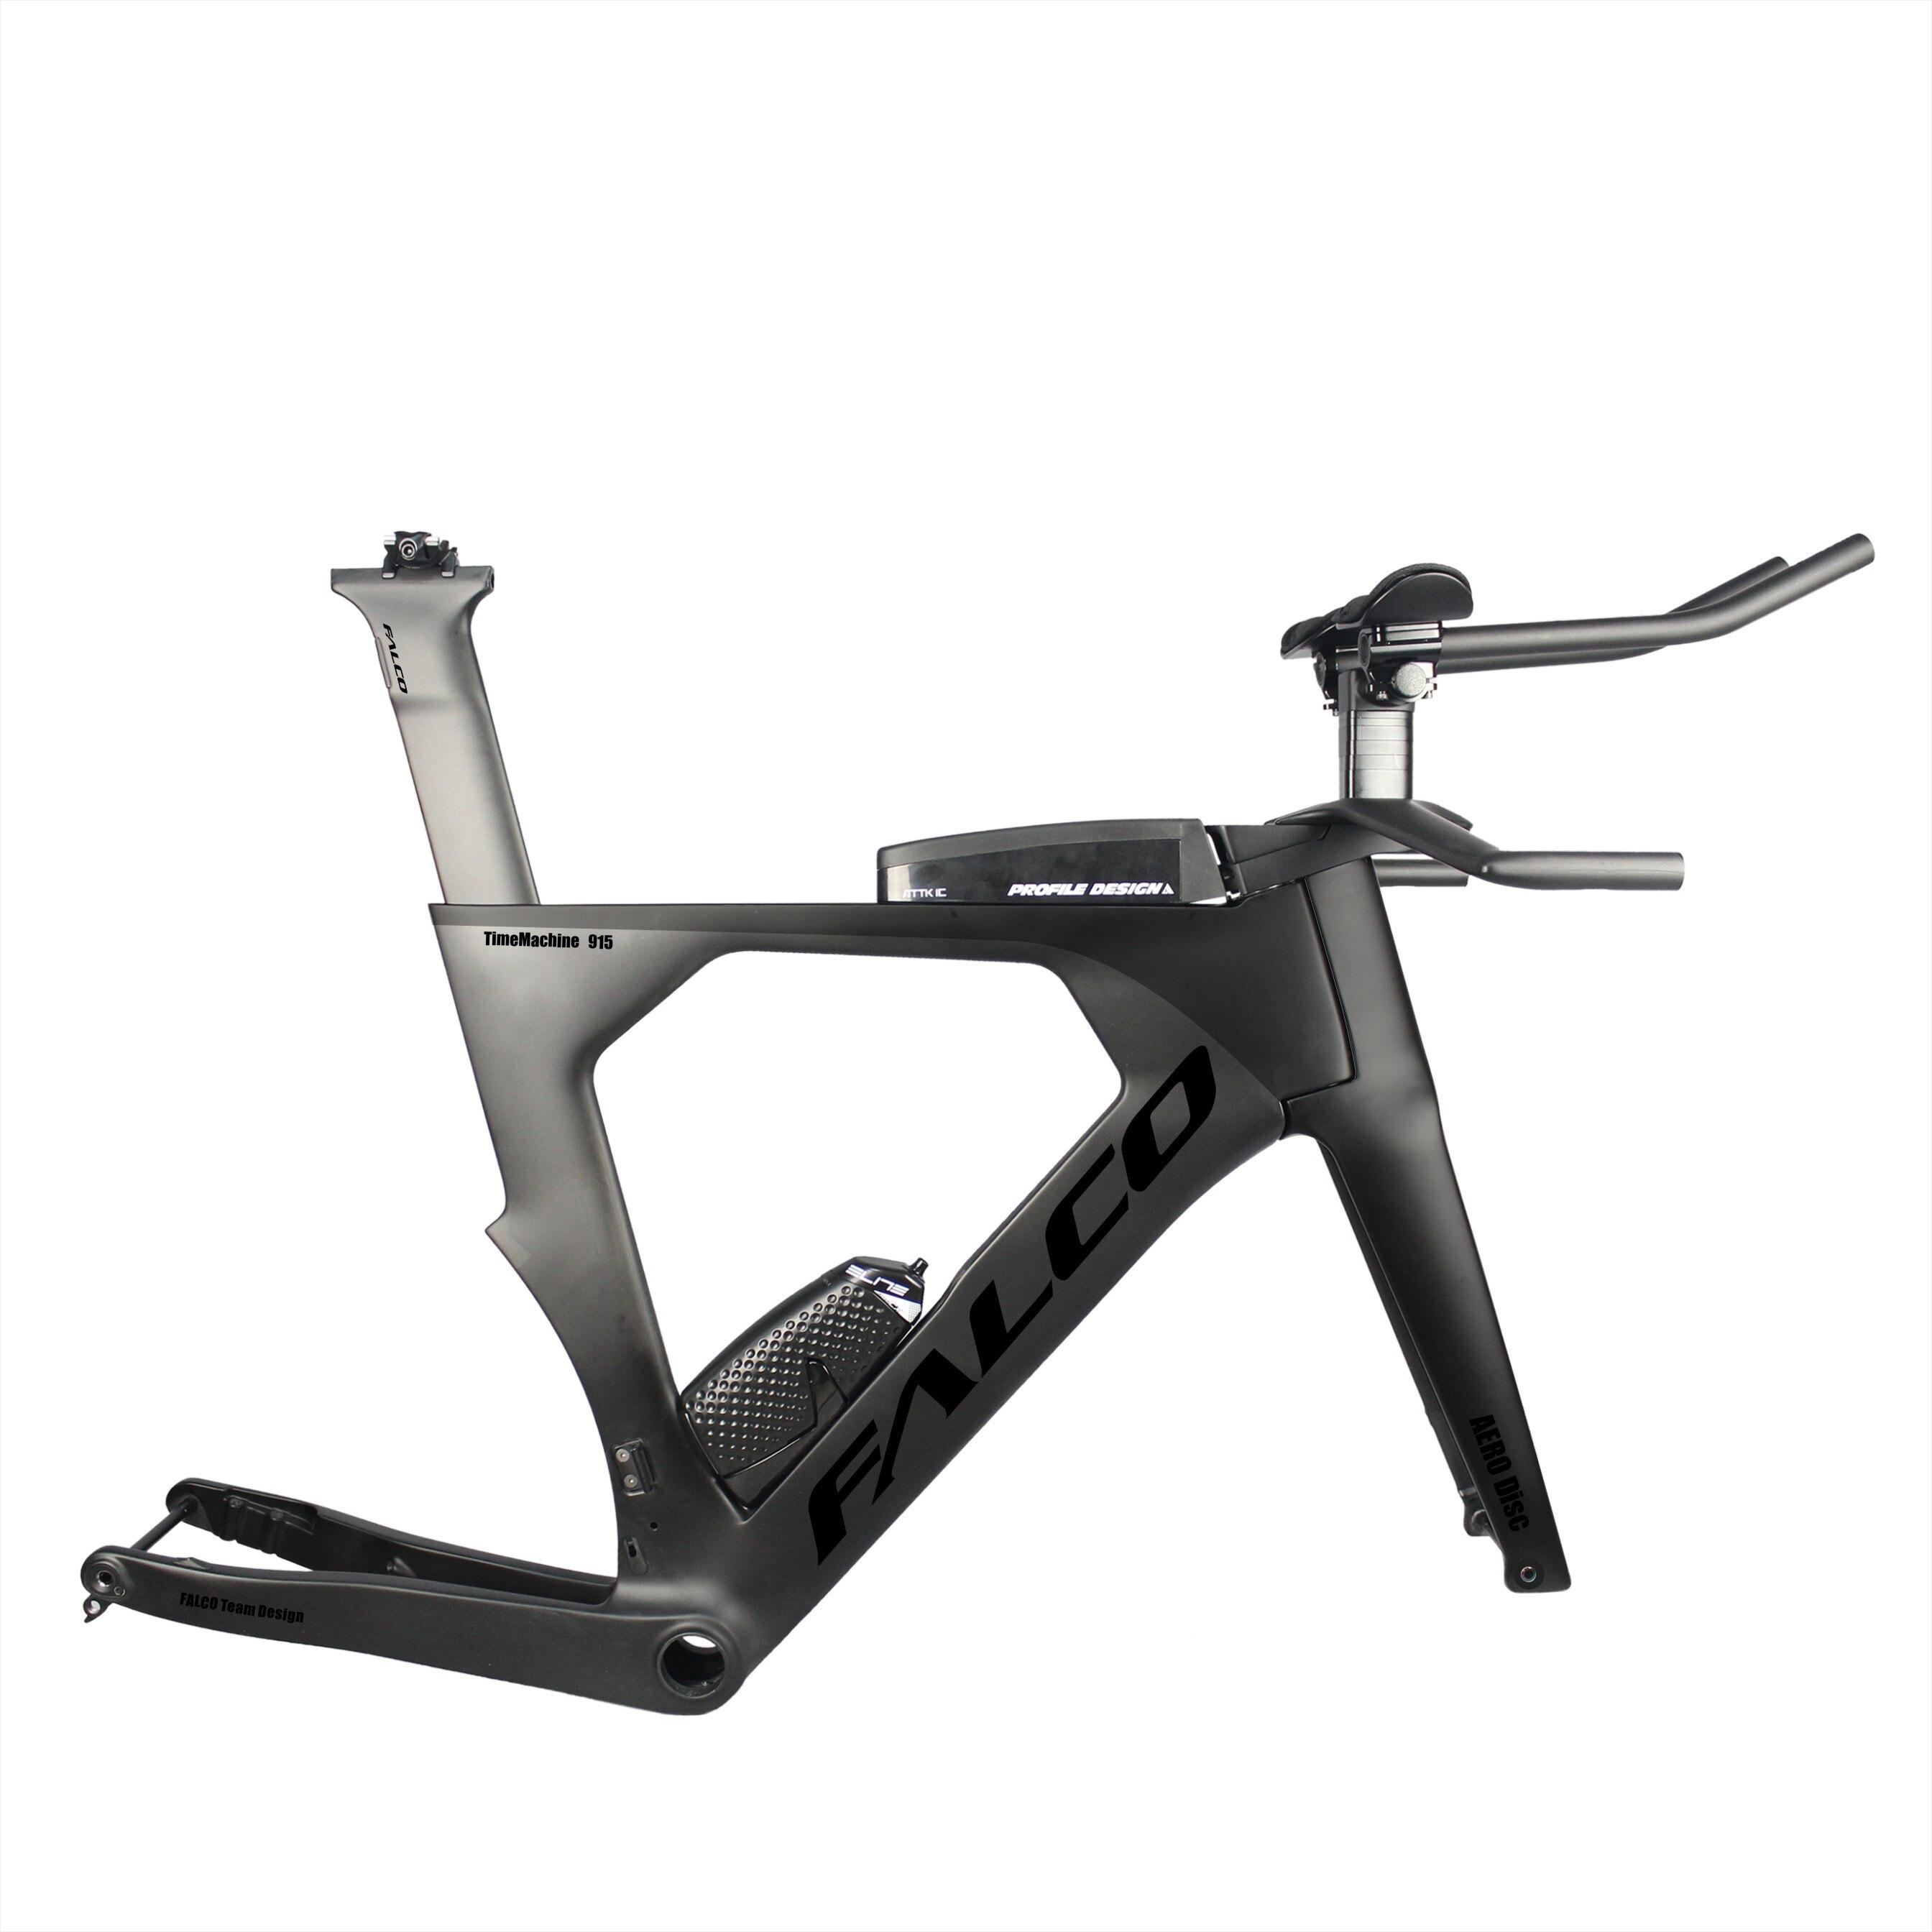 2019 Aero Disc Brake TT Bike Frame 700C Carbon Fiber Frame 142*12 Thru Axle Chinese Taiwan Bike Frame DI2 TT Carbon Frameset